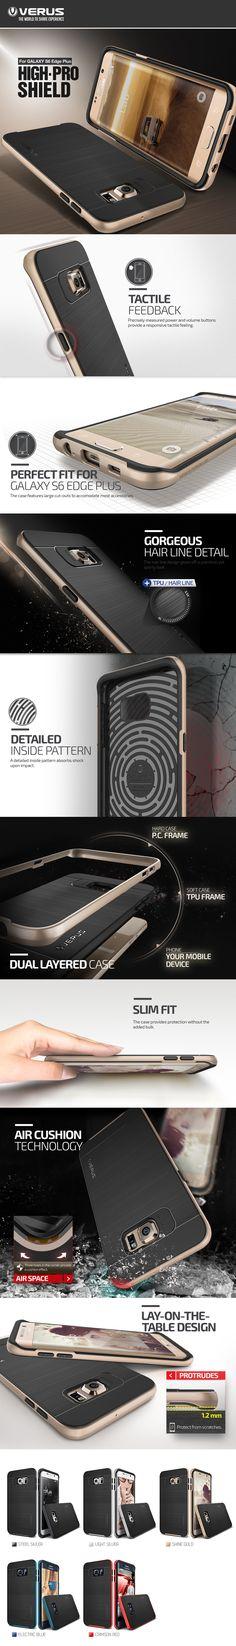 Verus Samsung Galaxy S6 Edge Plus Case High Pro Shield Series - Galaxy S6 Edge Plus - Samsung - Device